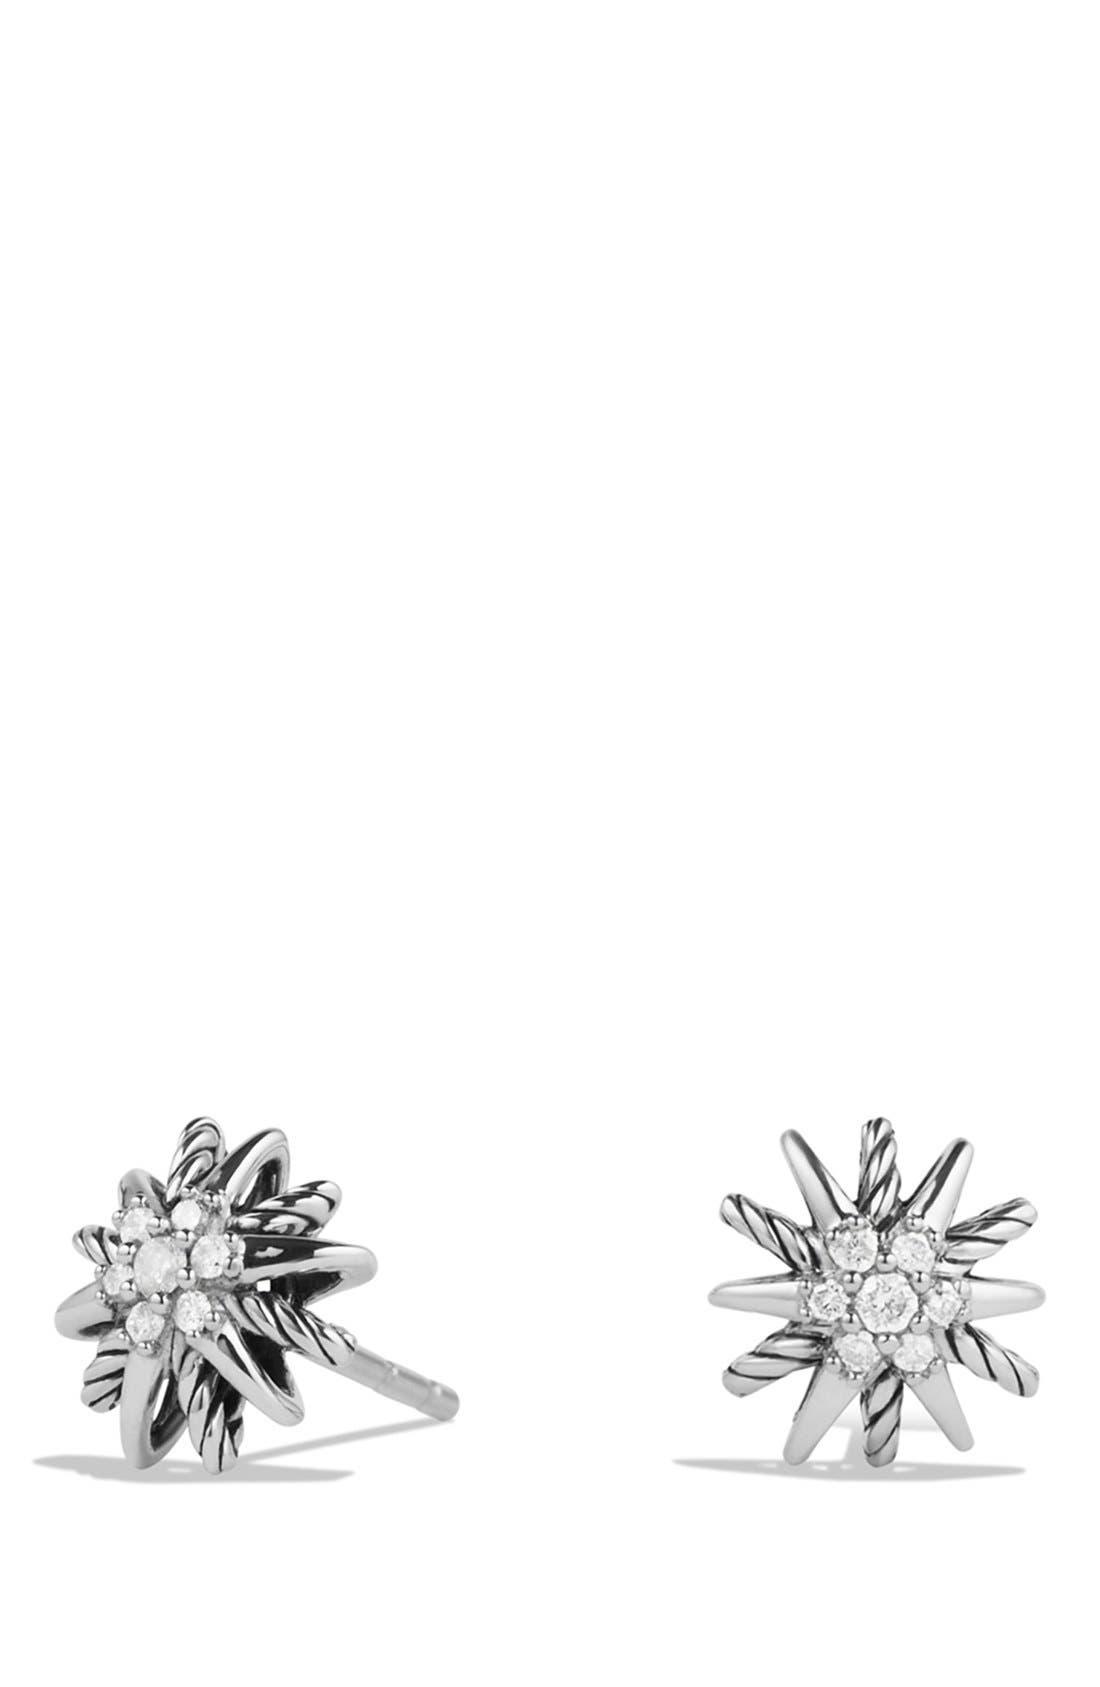 David Yurman 'Starburst' Earrings with Diamonds